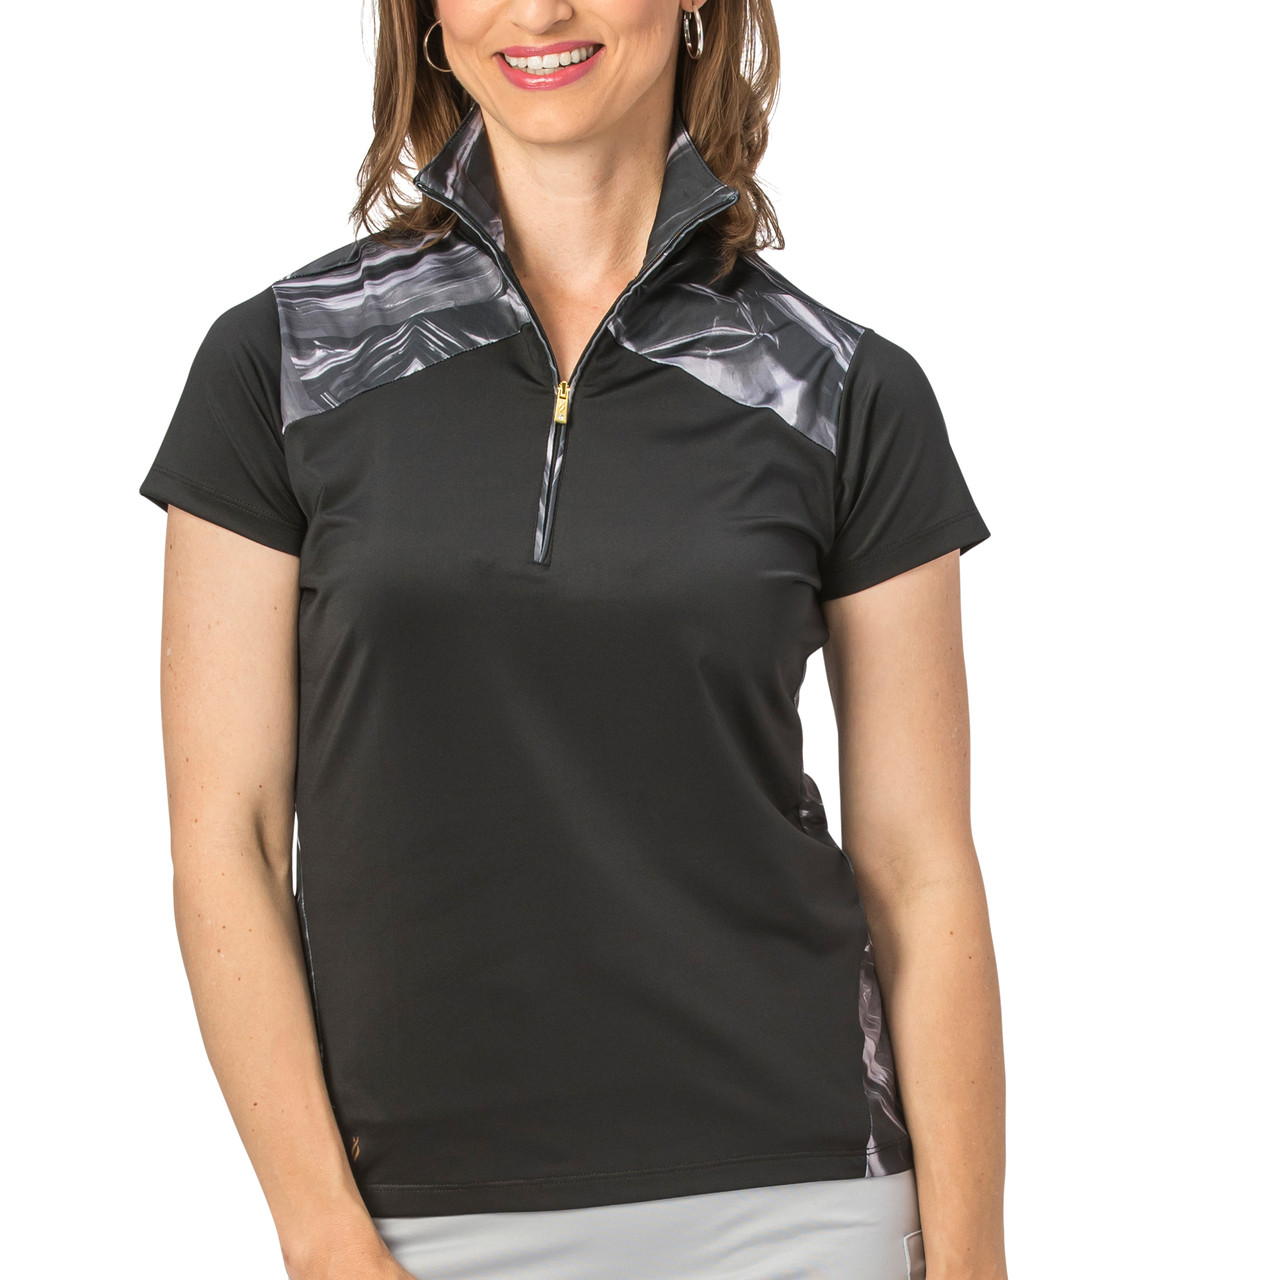 56cc9a3e Nancy Lopez Hologram Short Sleeve Polo - Black   Golf4Her